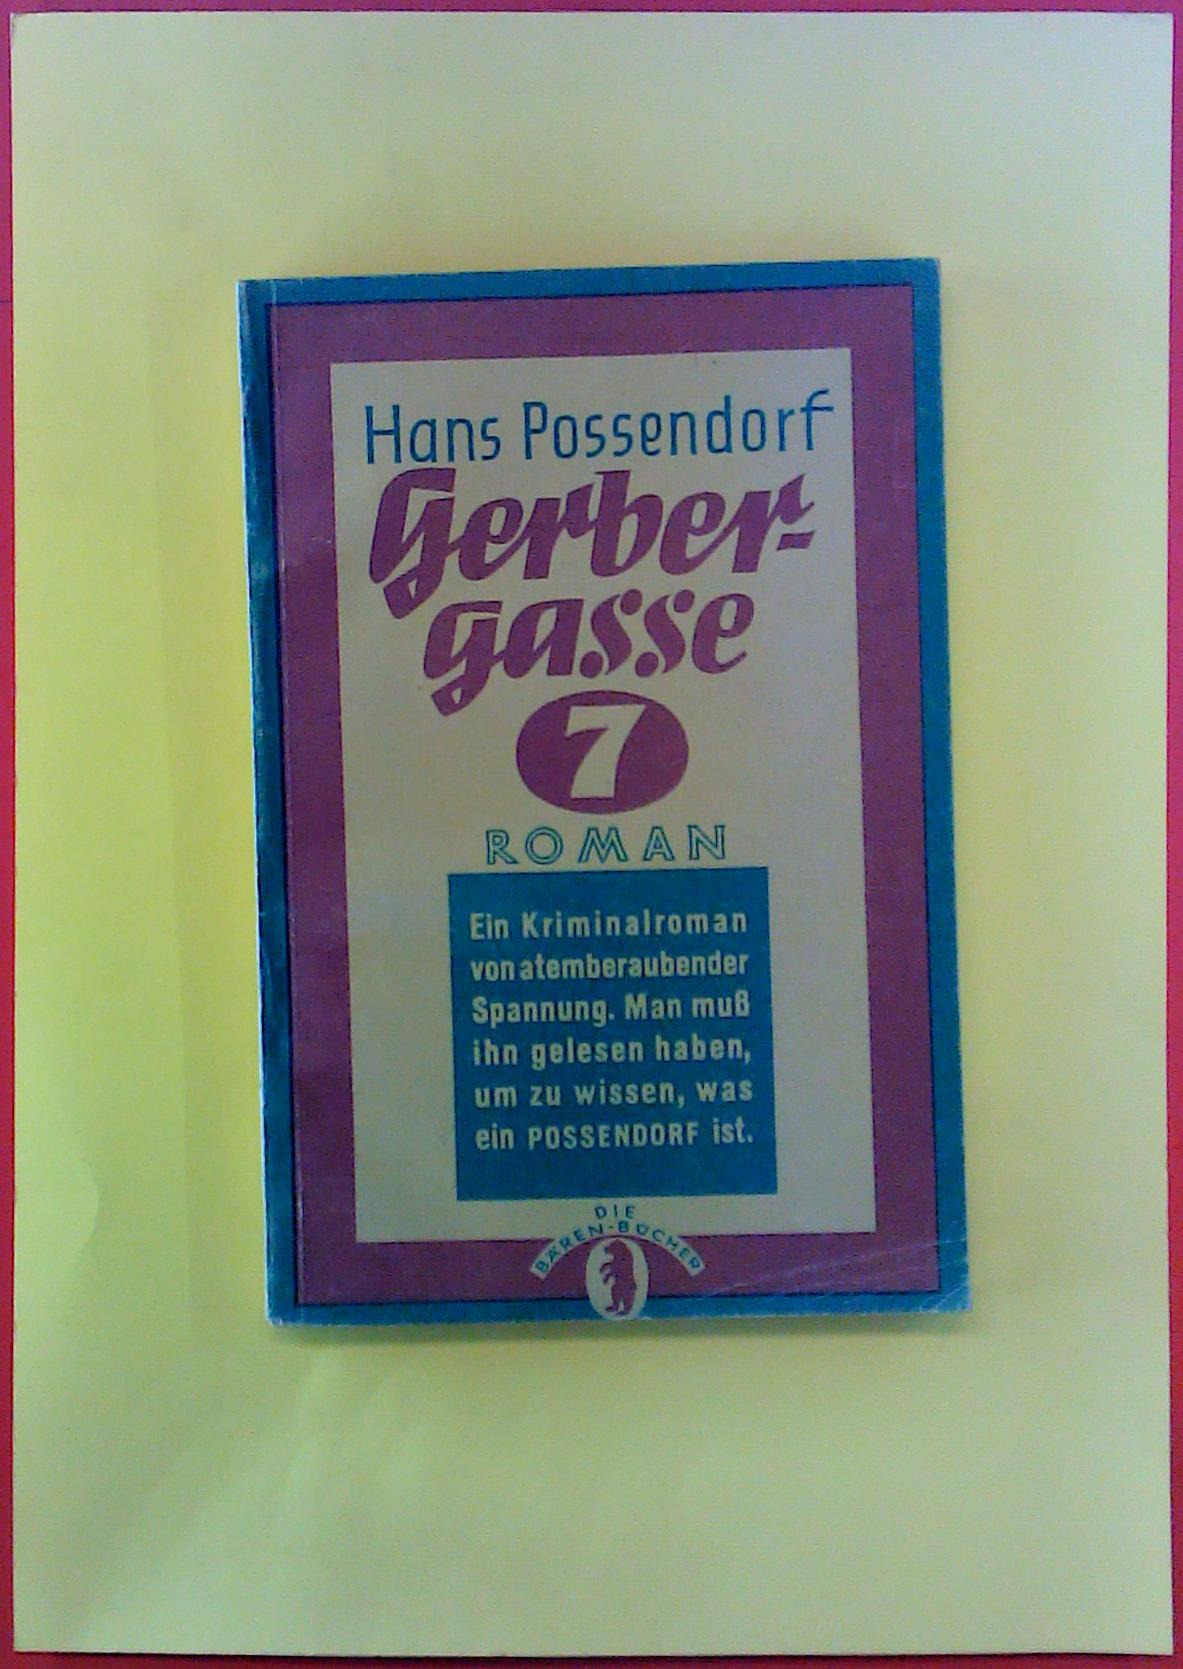 Gerbergasse NR 7: Hans Possendorf